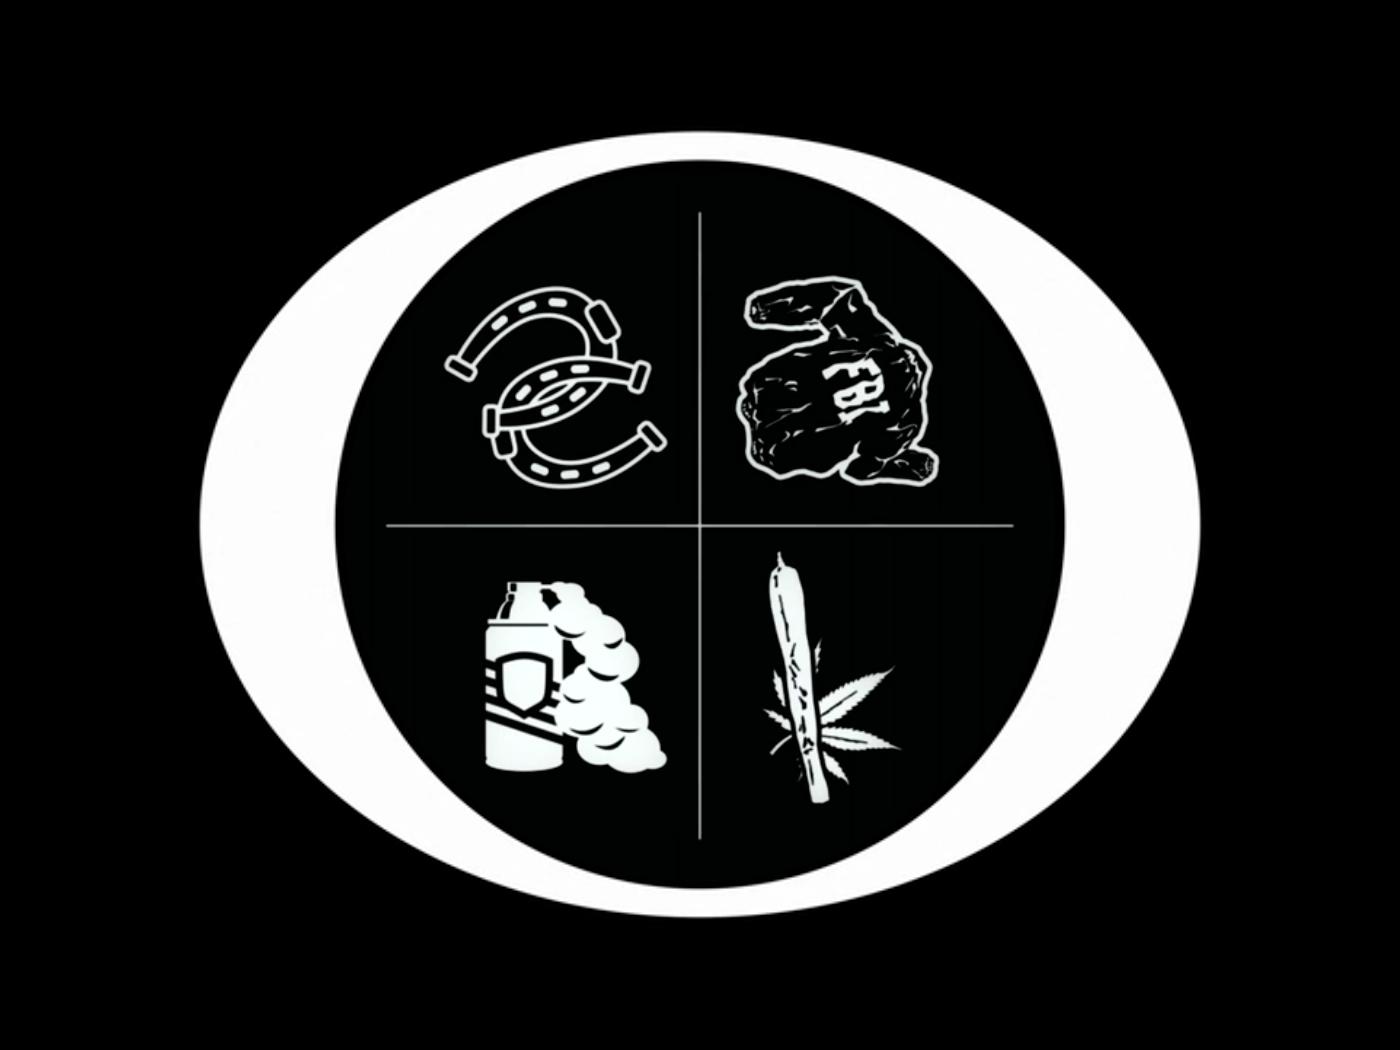 Ozark Season 2 Episode 4 Diagram